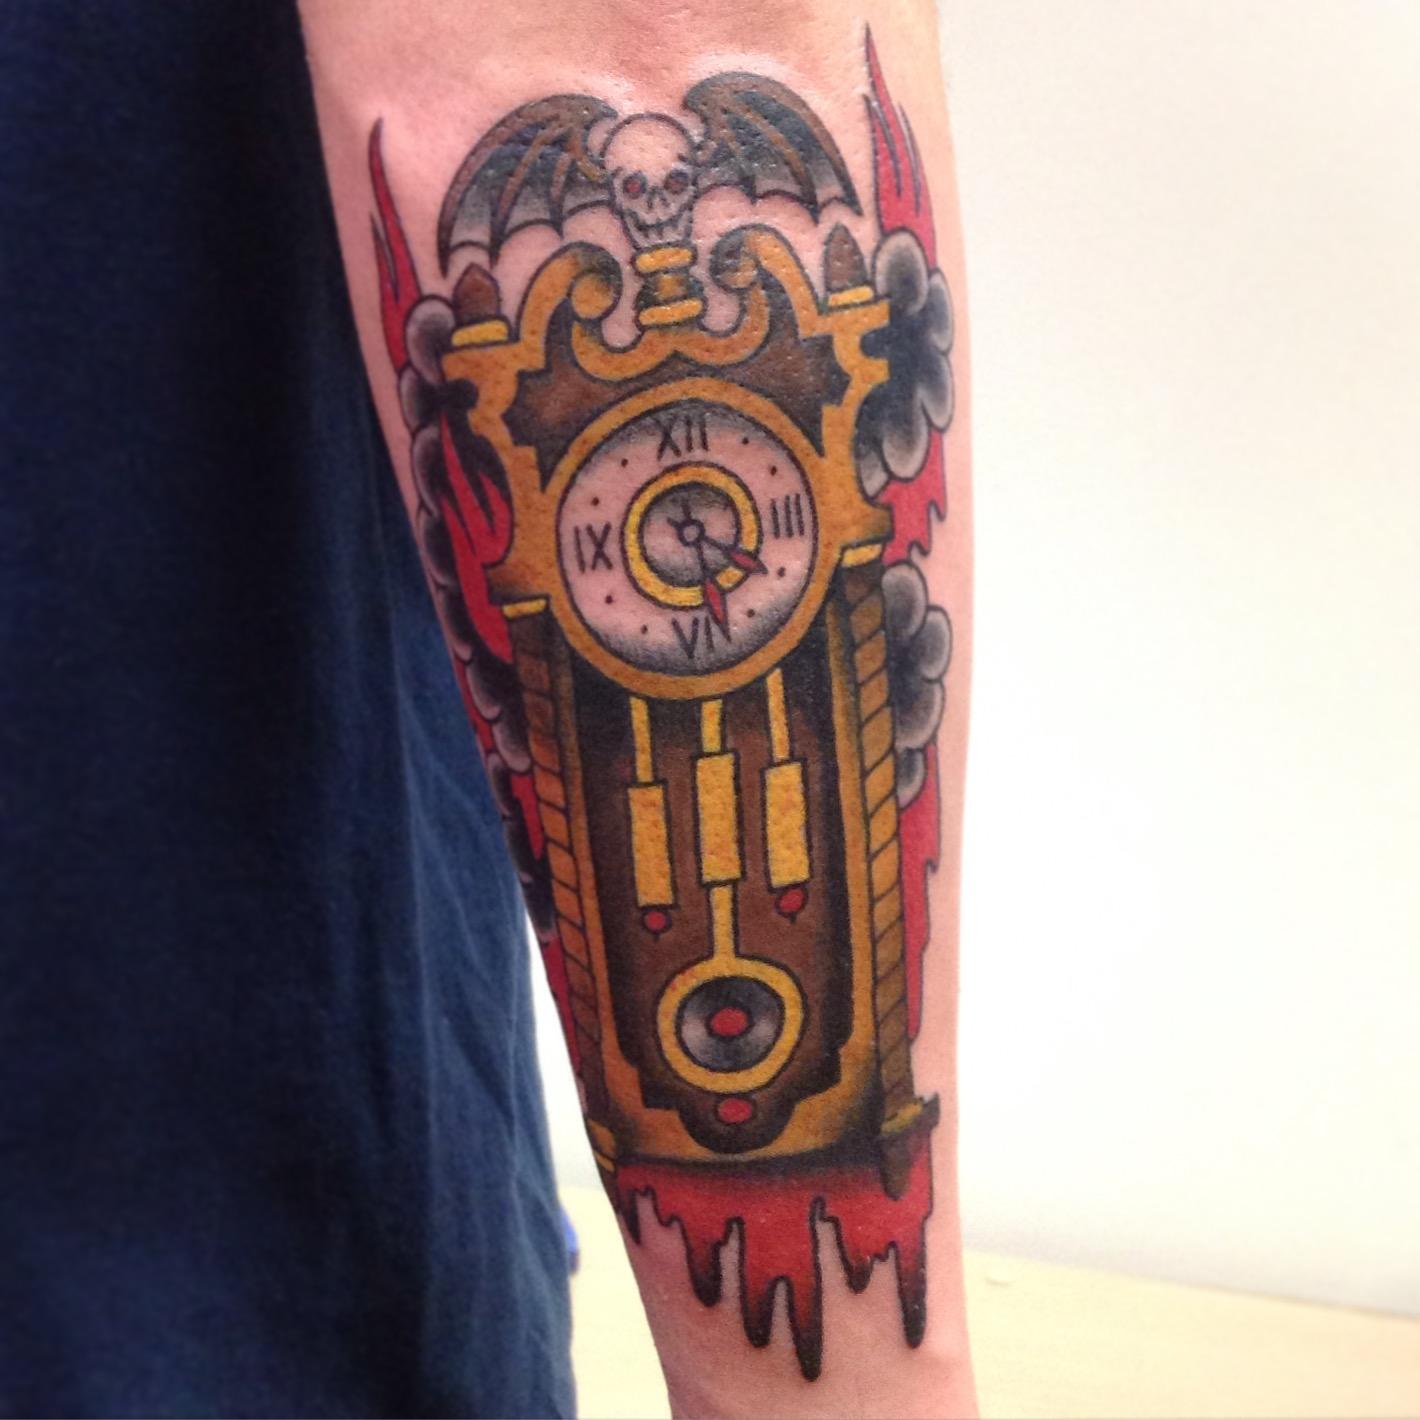 Tattoo by James Delzel